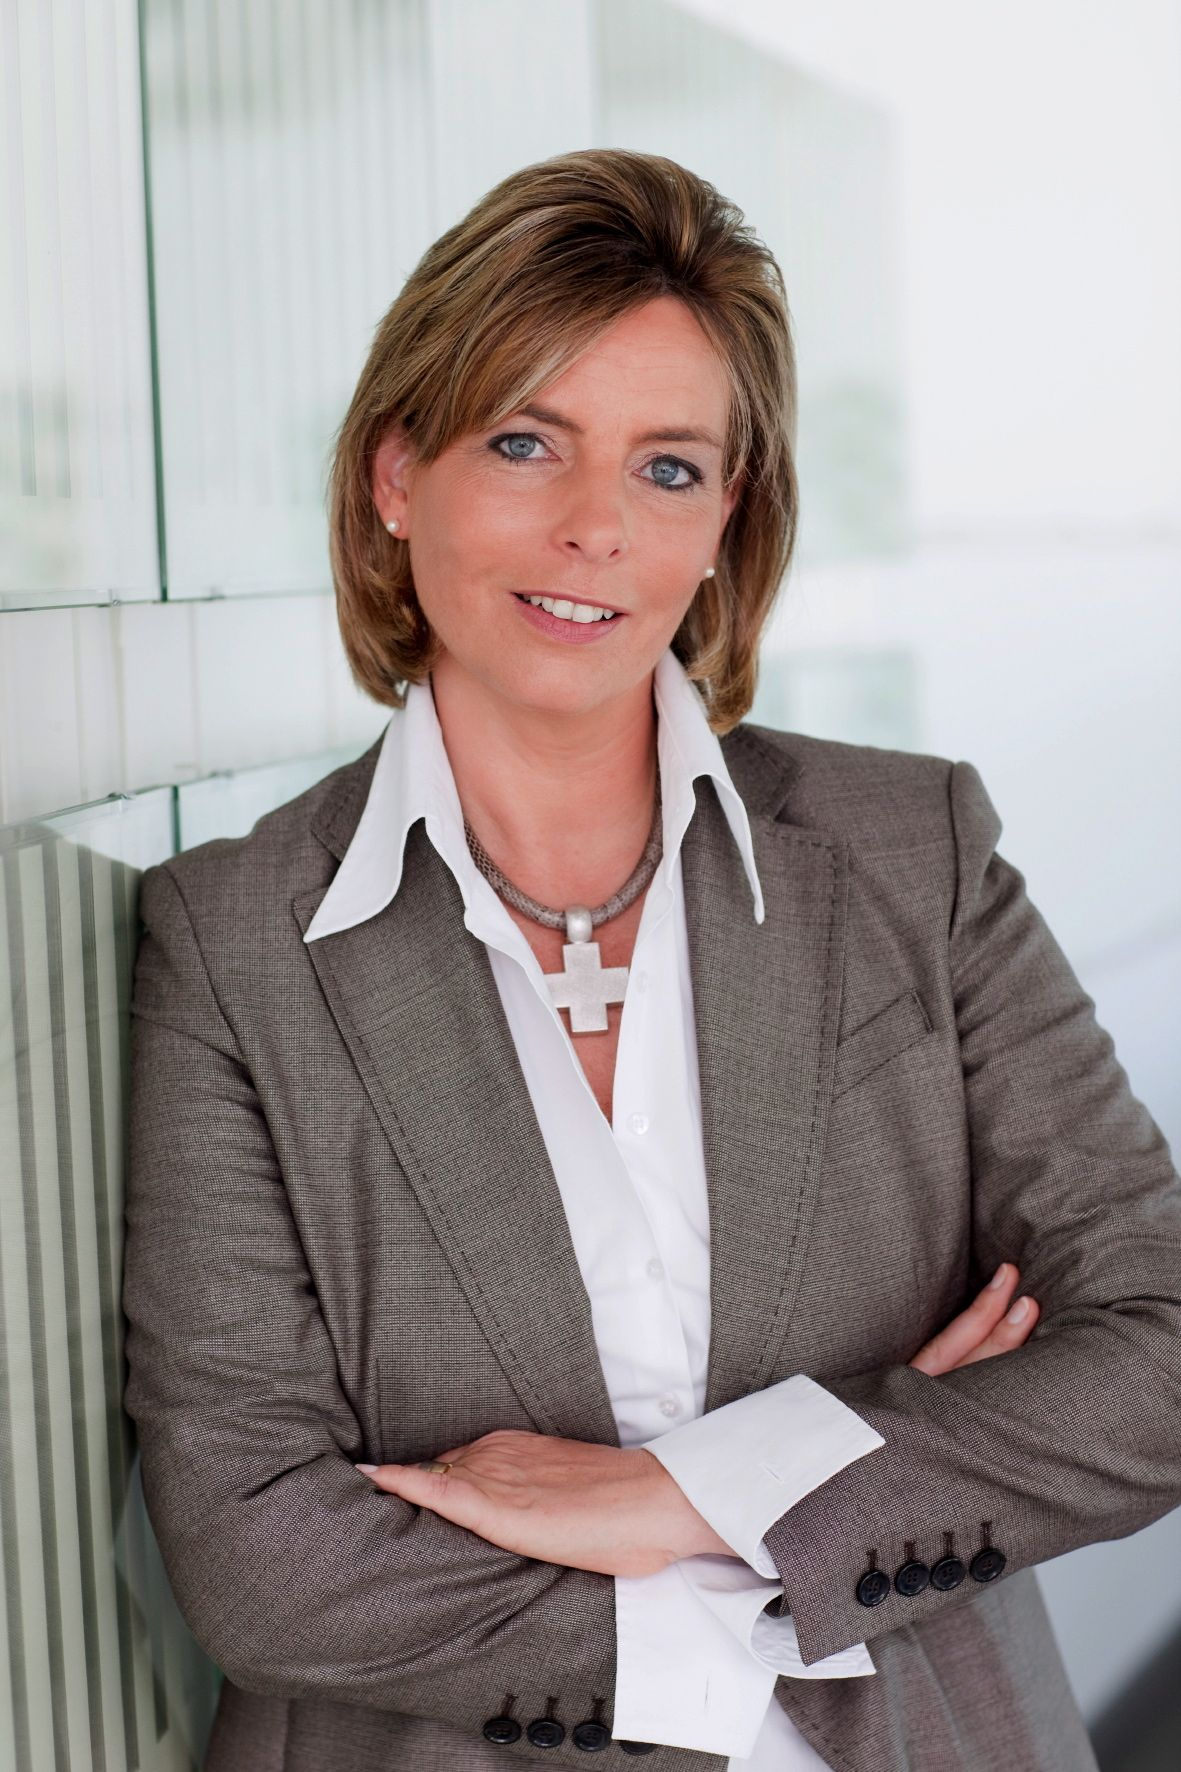 Angelika Gifford Managerin des Jahres 2009